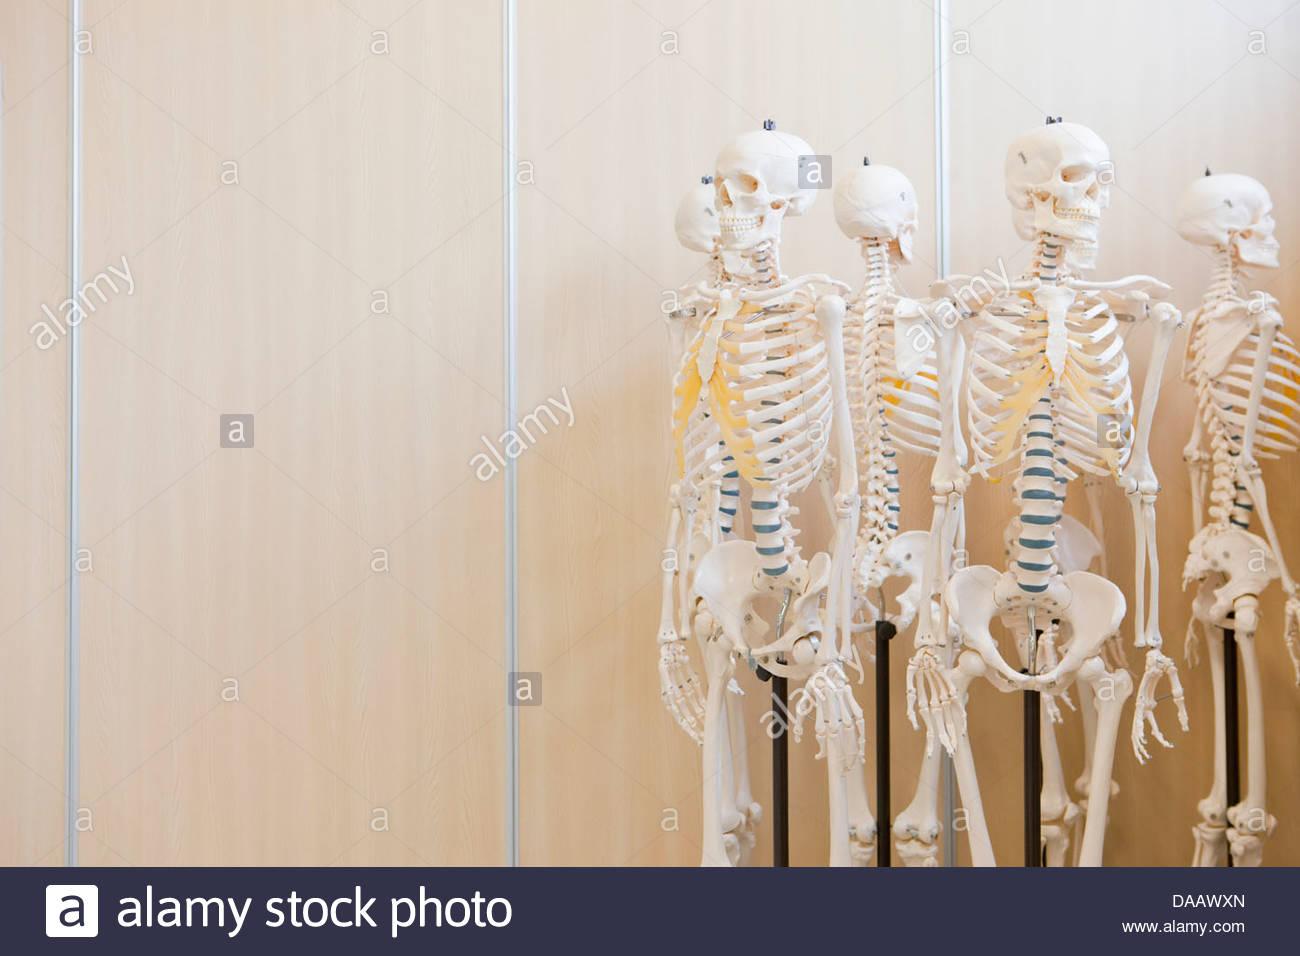 Skeleton models - Stock Image